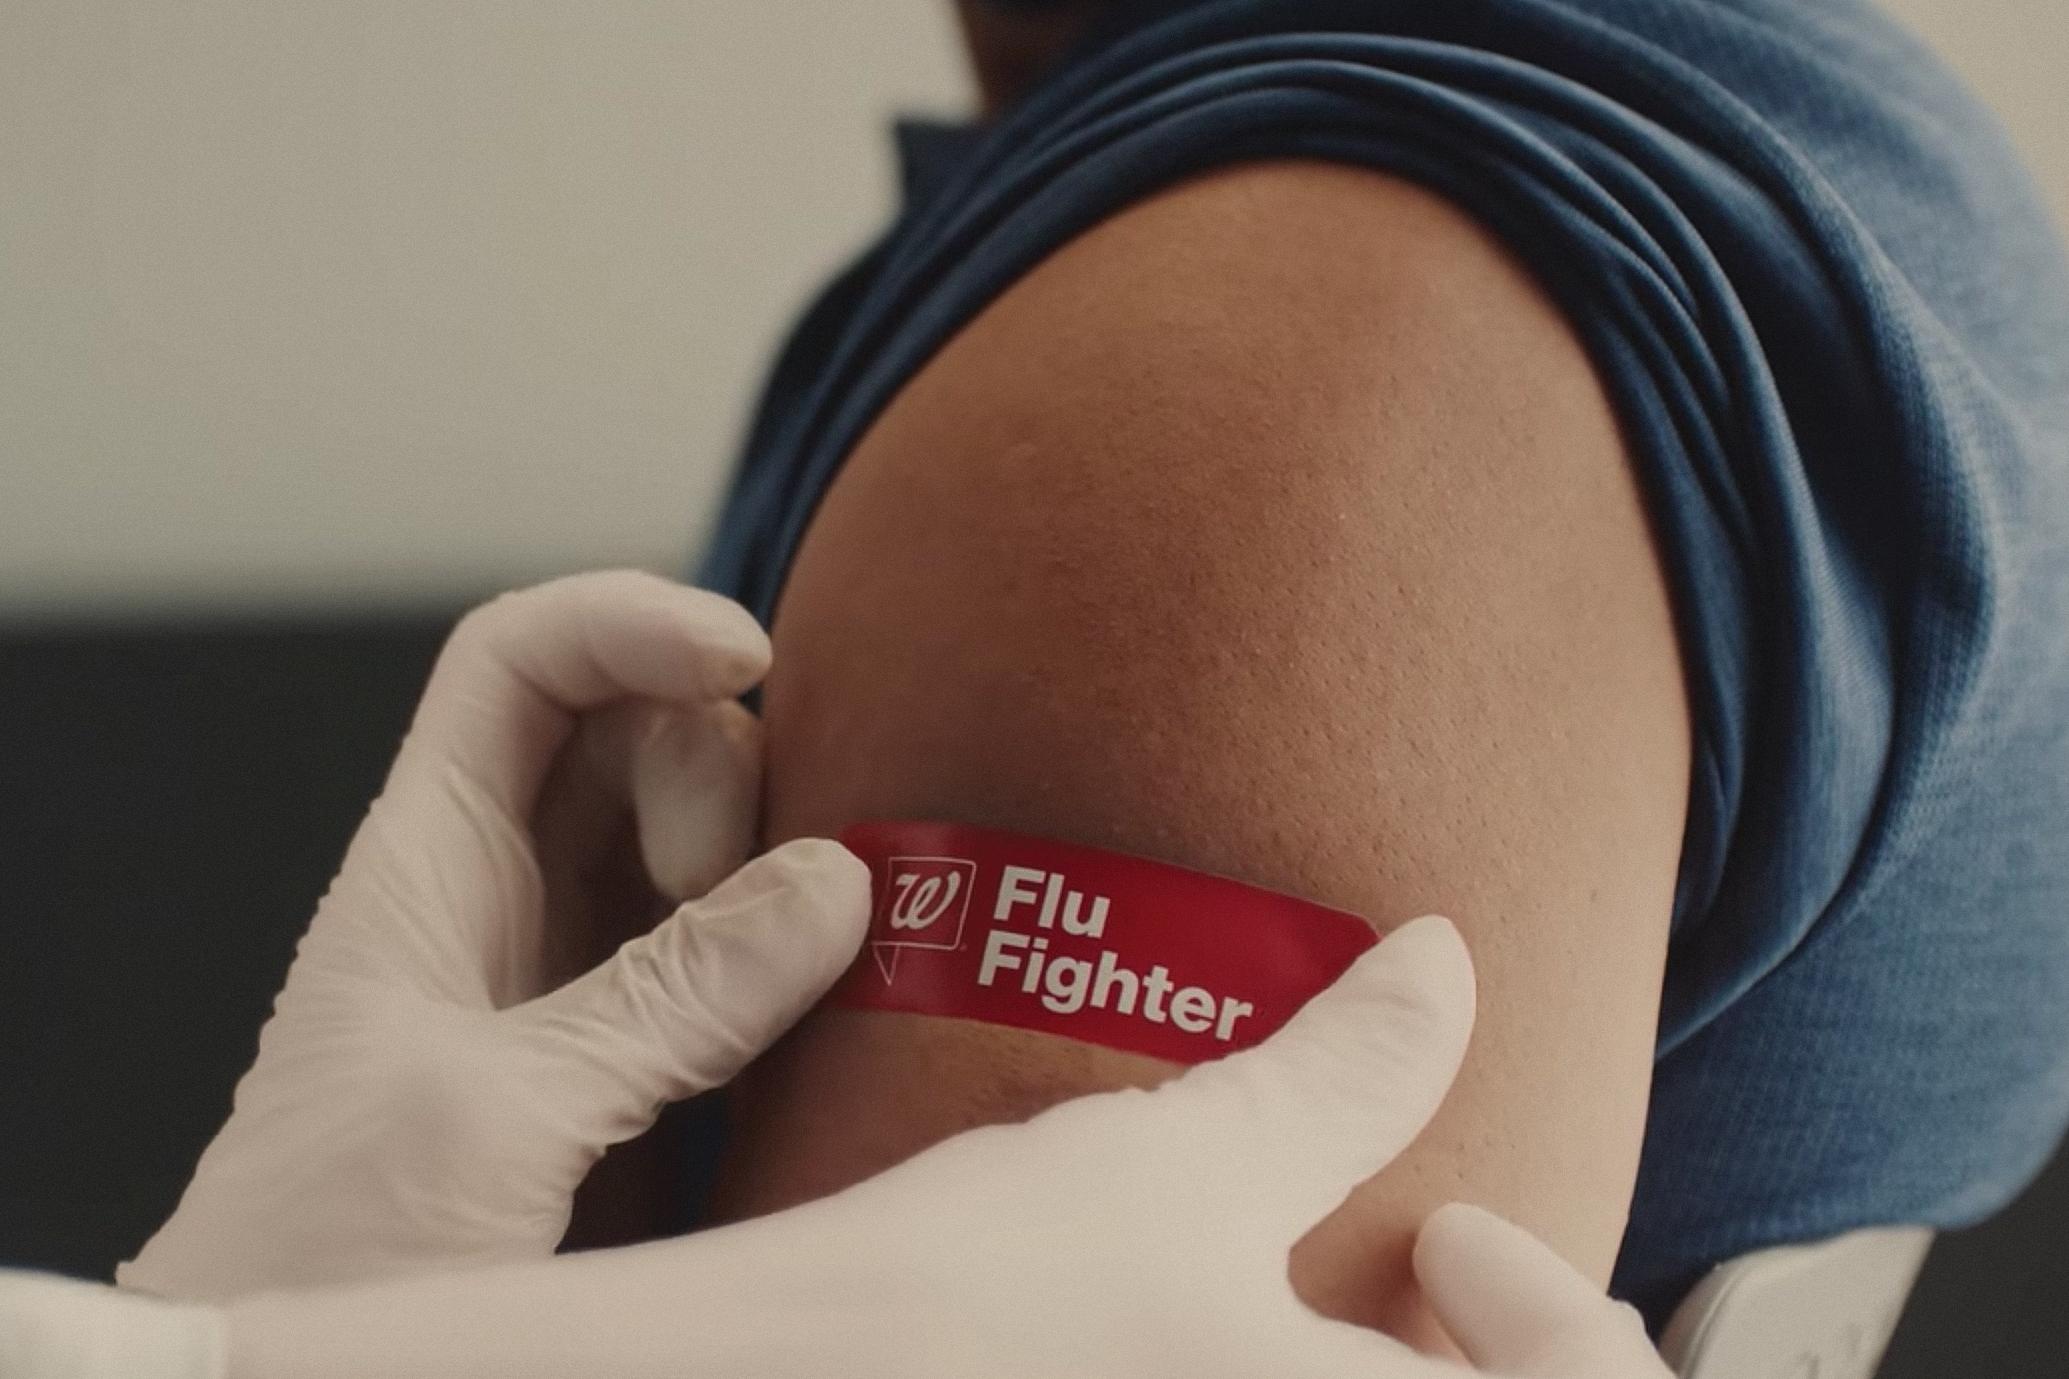 Medical misinformation COVID 19 coronavirus flu season vaccine anti vax One Medical trust